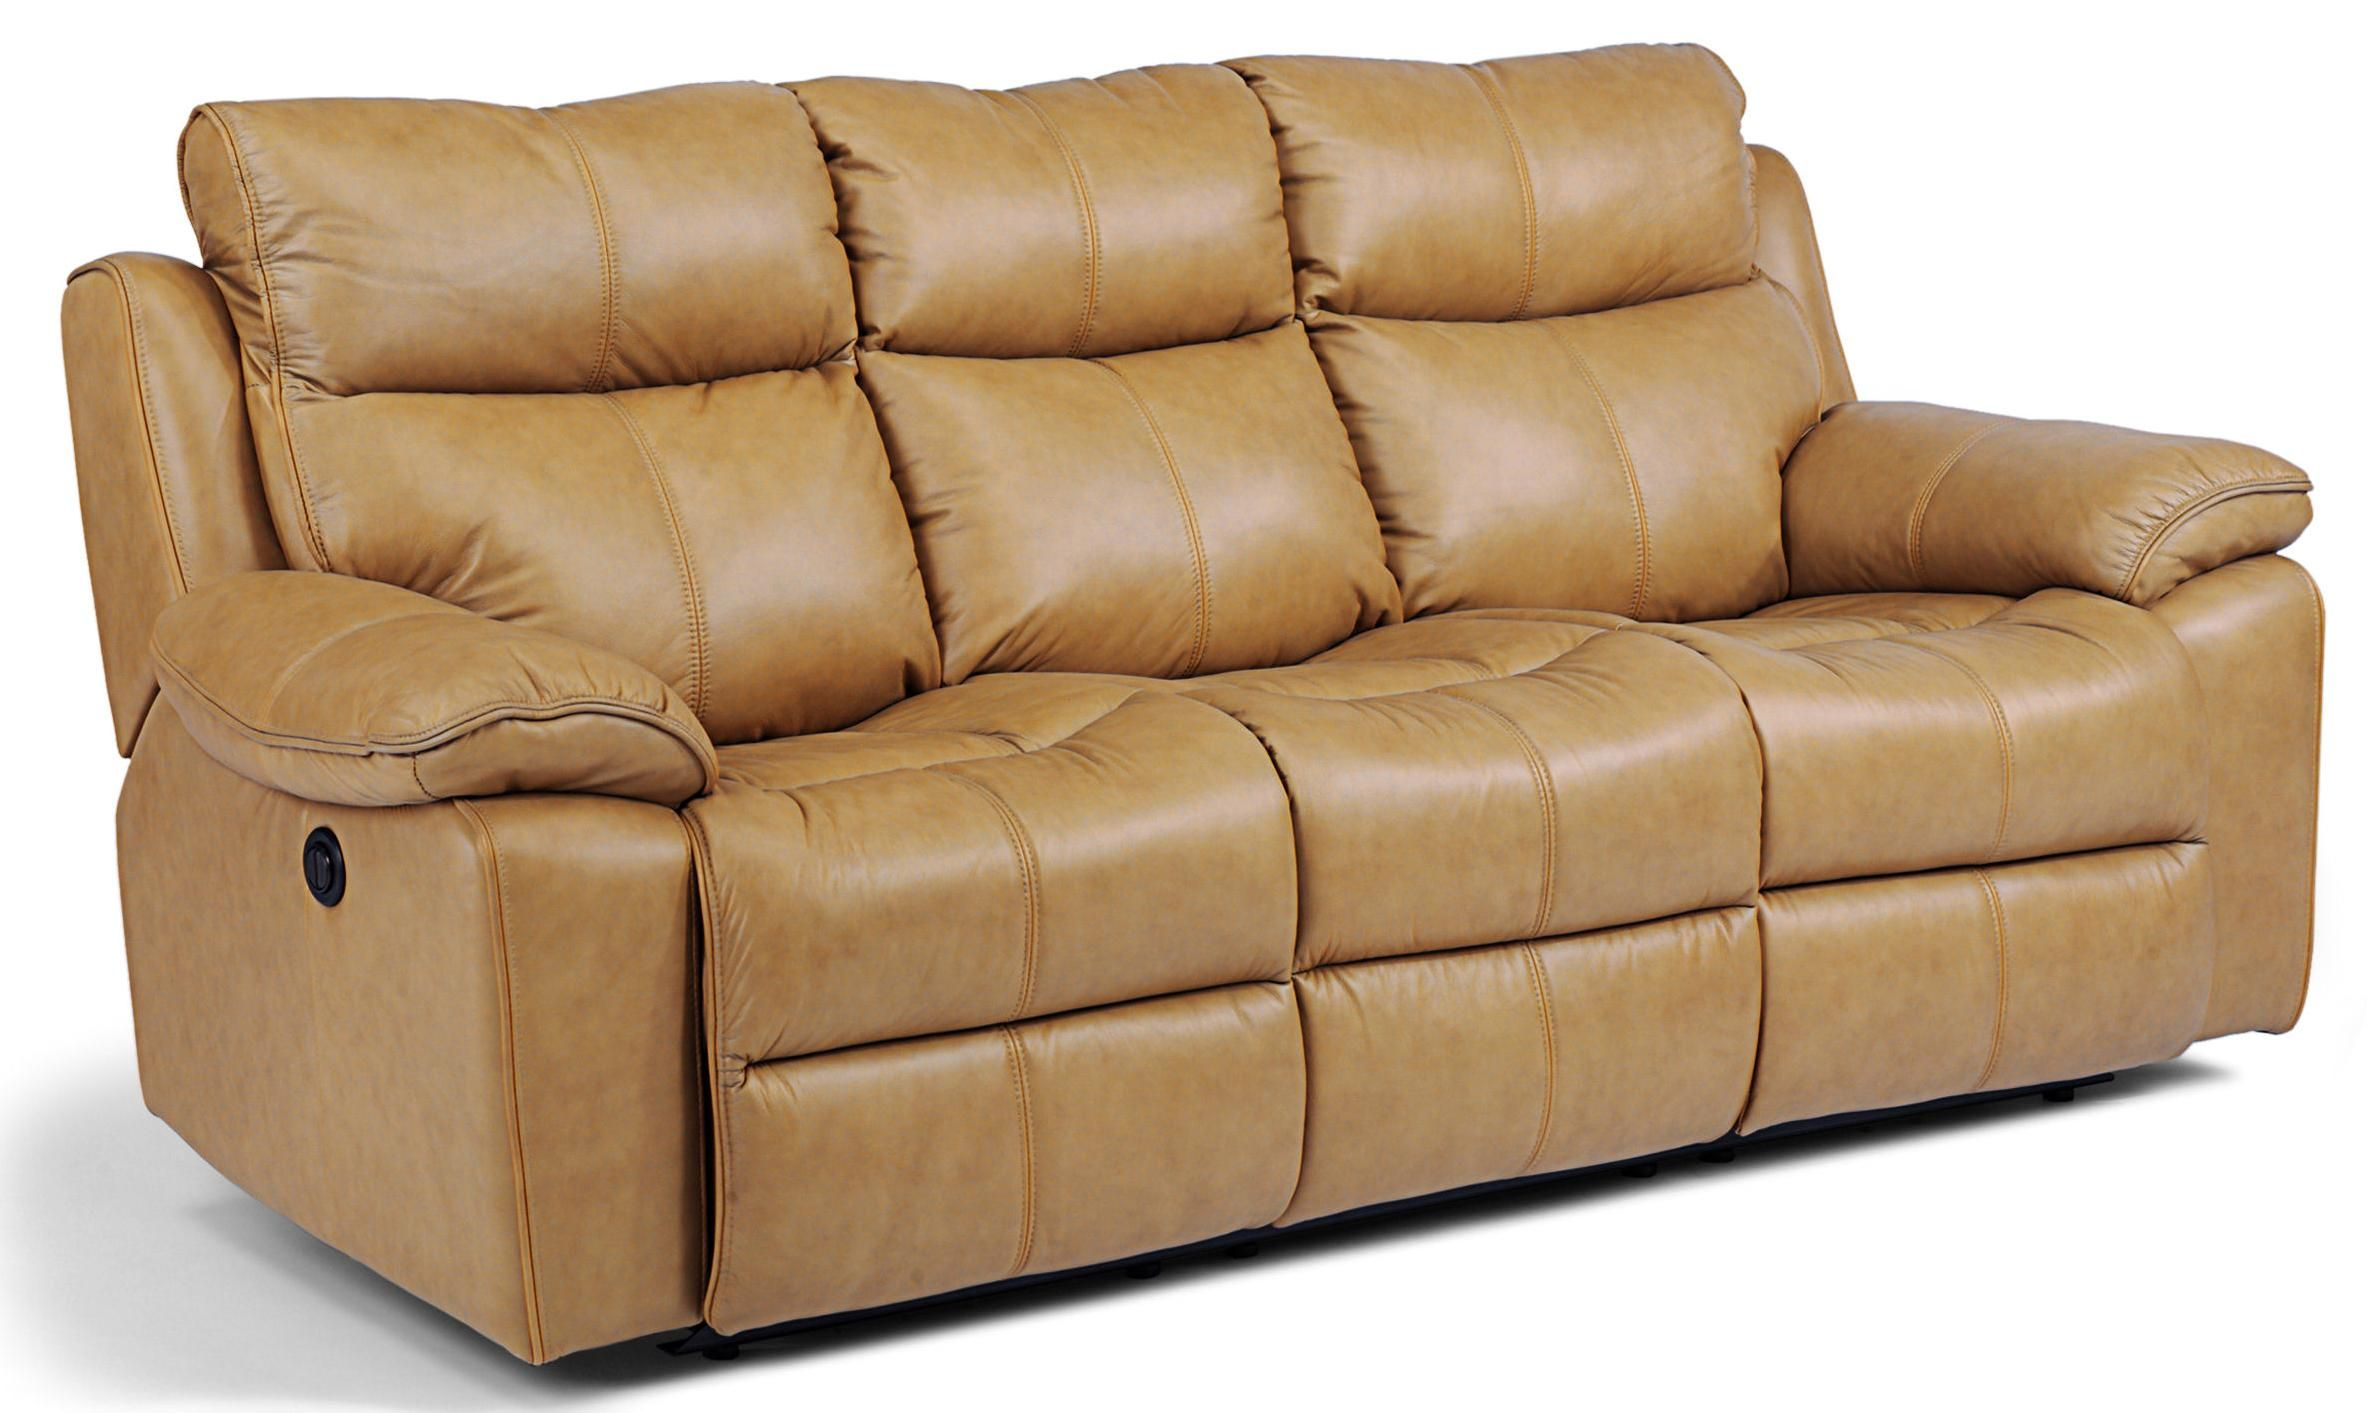 Latitudes Julio Power Reclining Sofa By Flexsteel Flexsteel